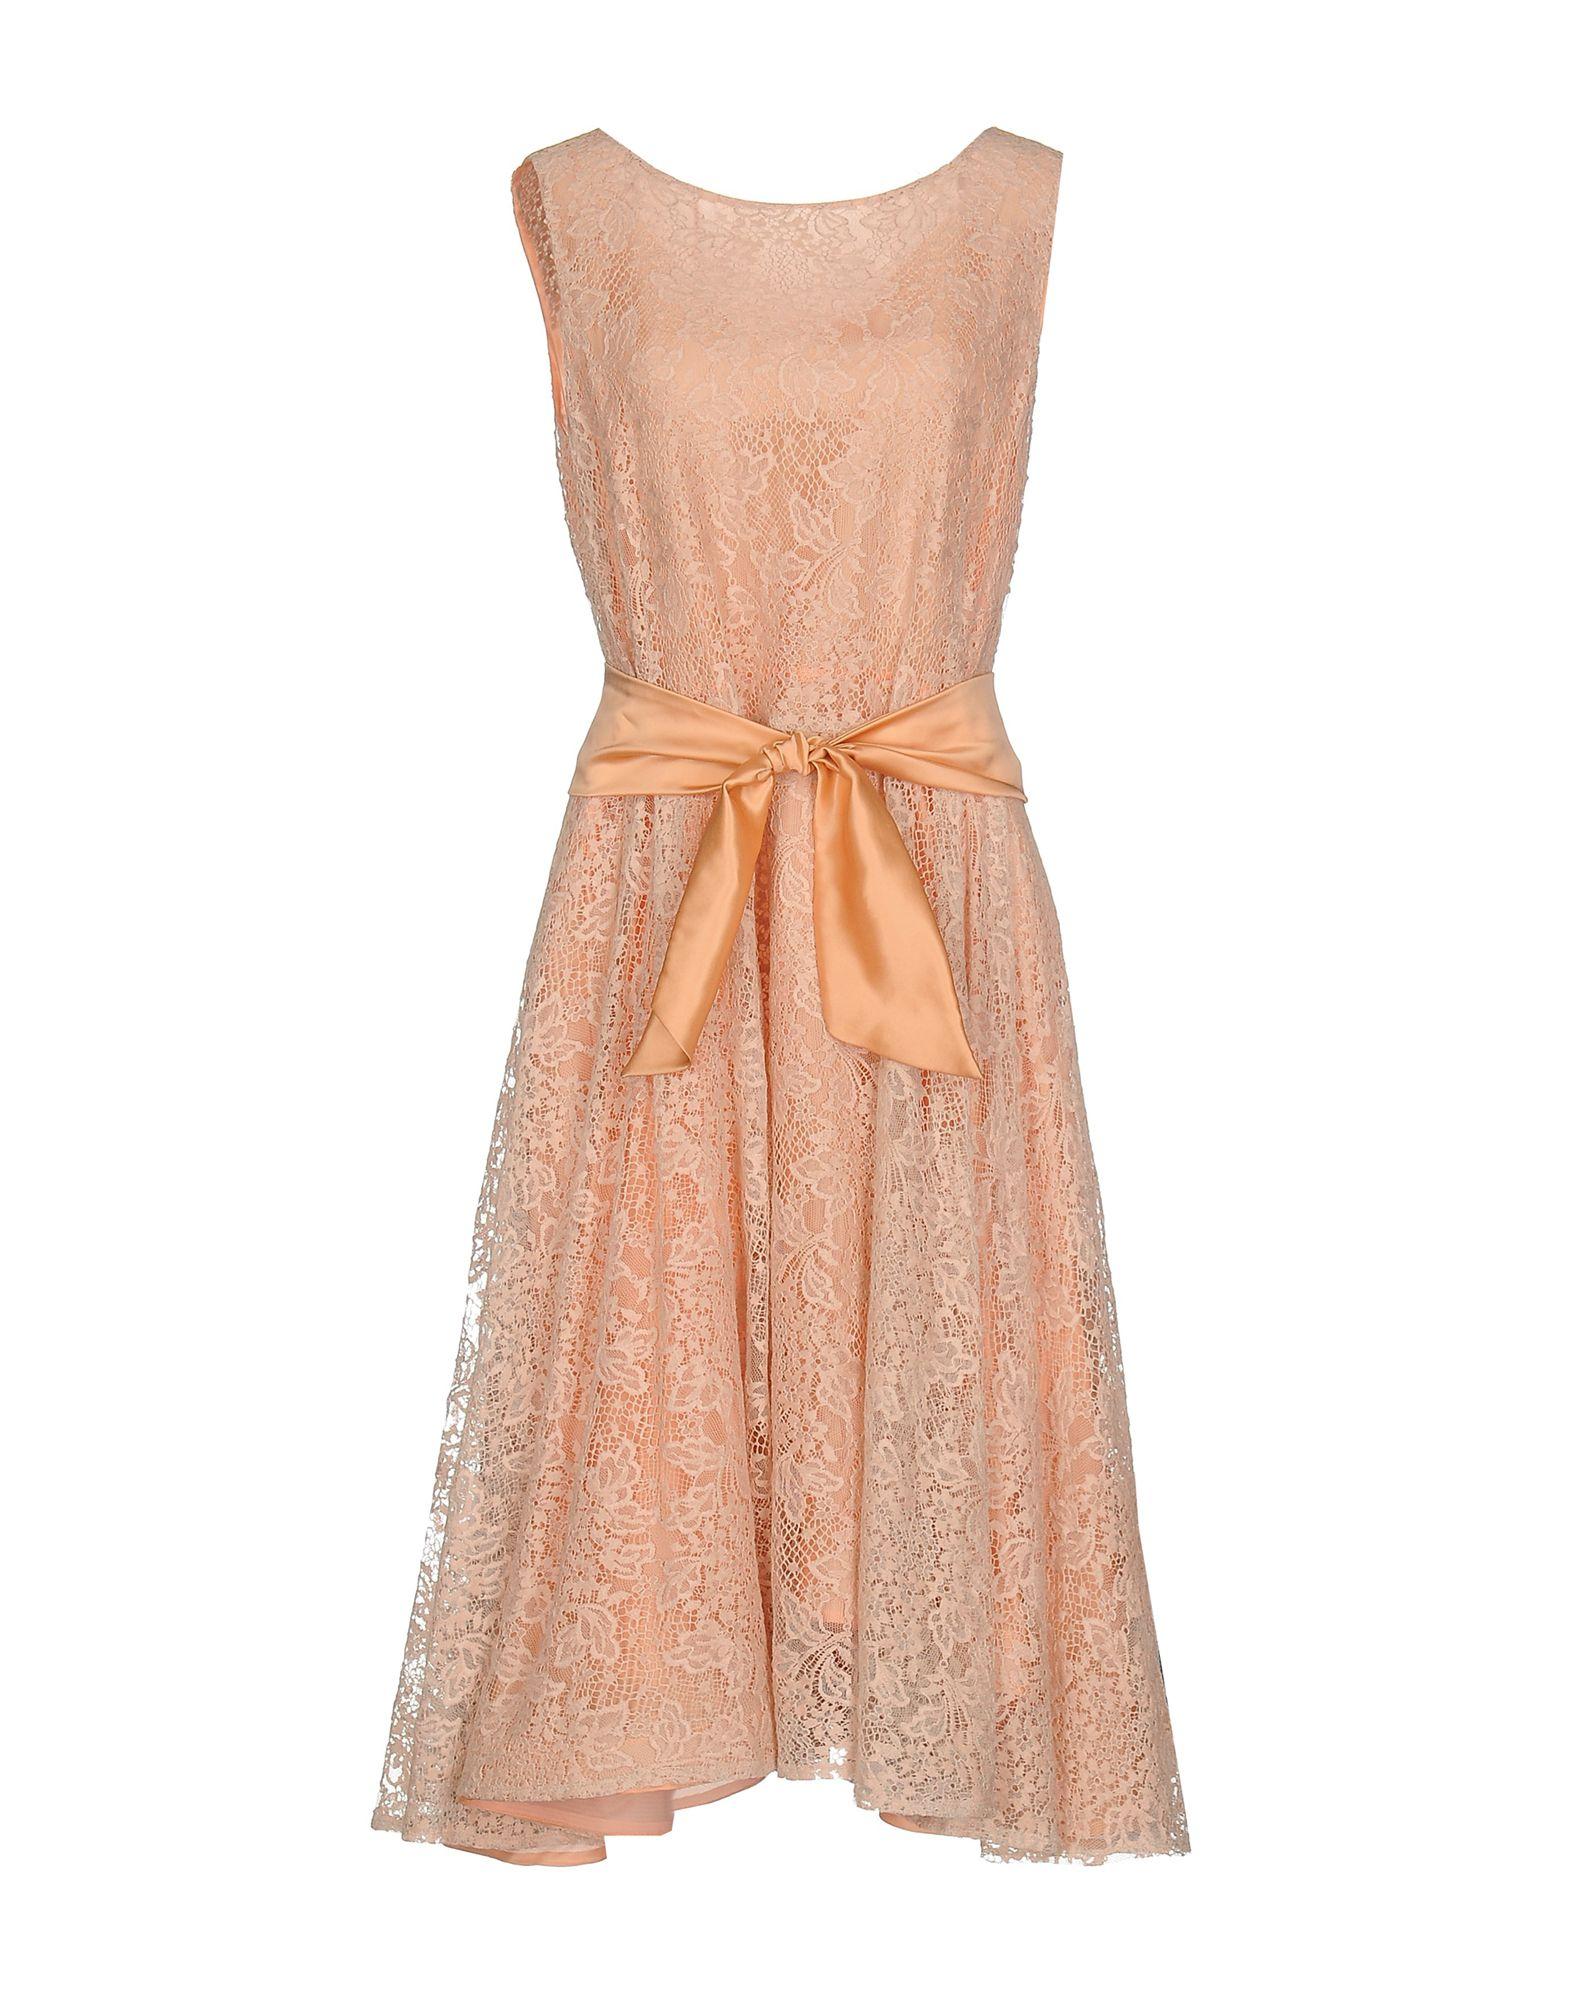 BOTONDI MILANO Платье до колена botondi milano платье до колена